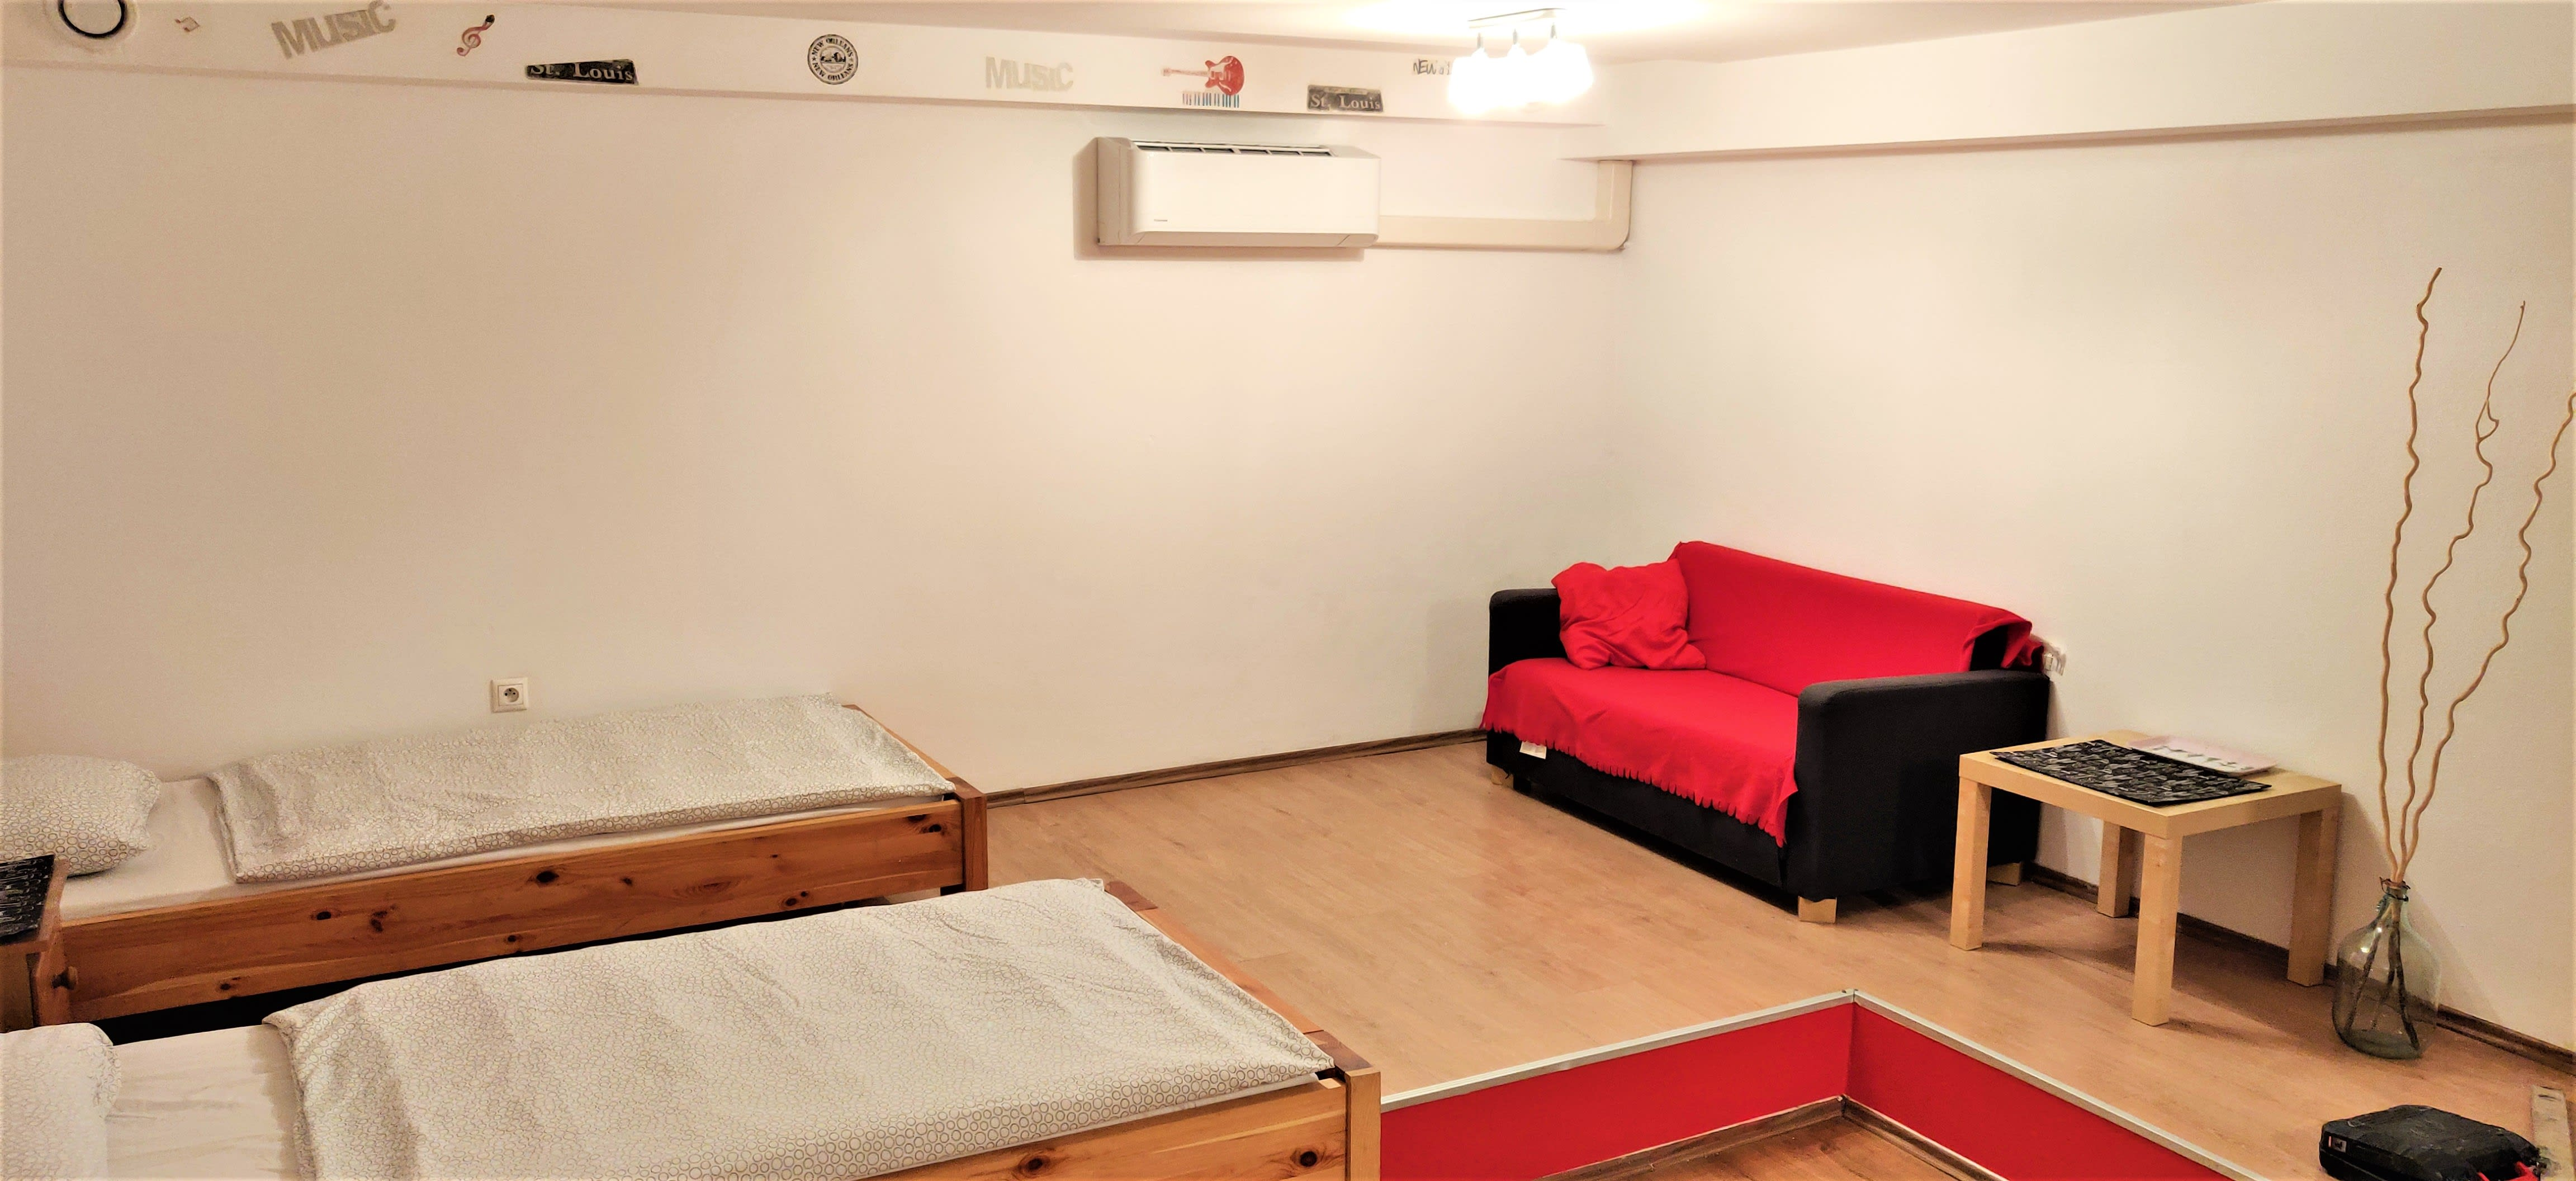 HOSTEL - Art Hostel Taurus